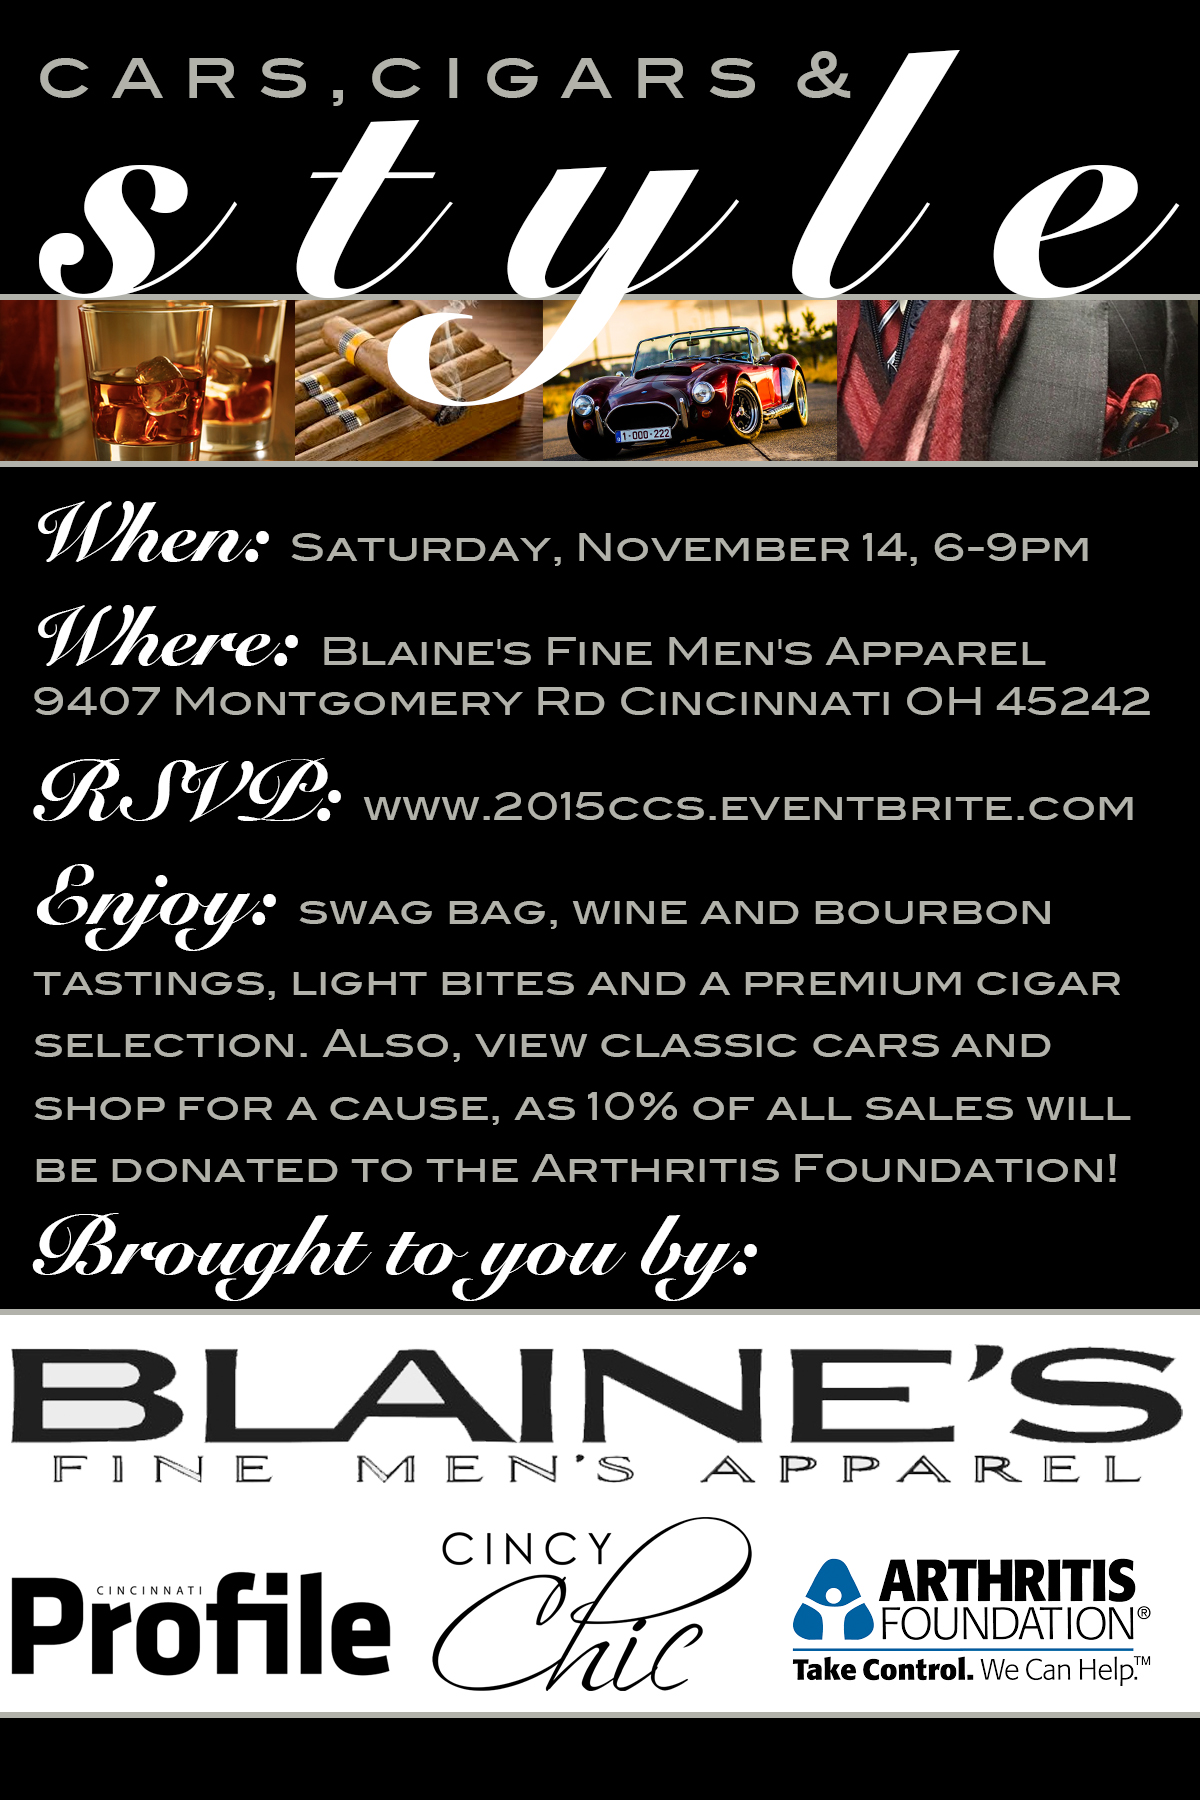 Cars, Cigars & Style Blaines